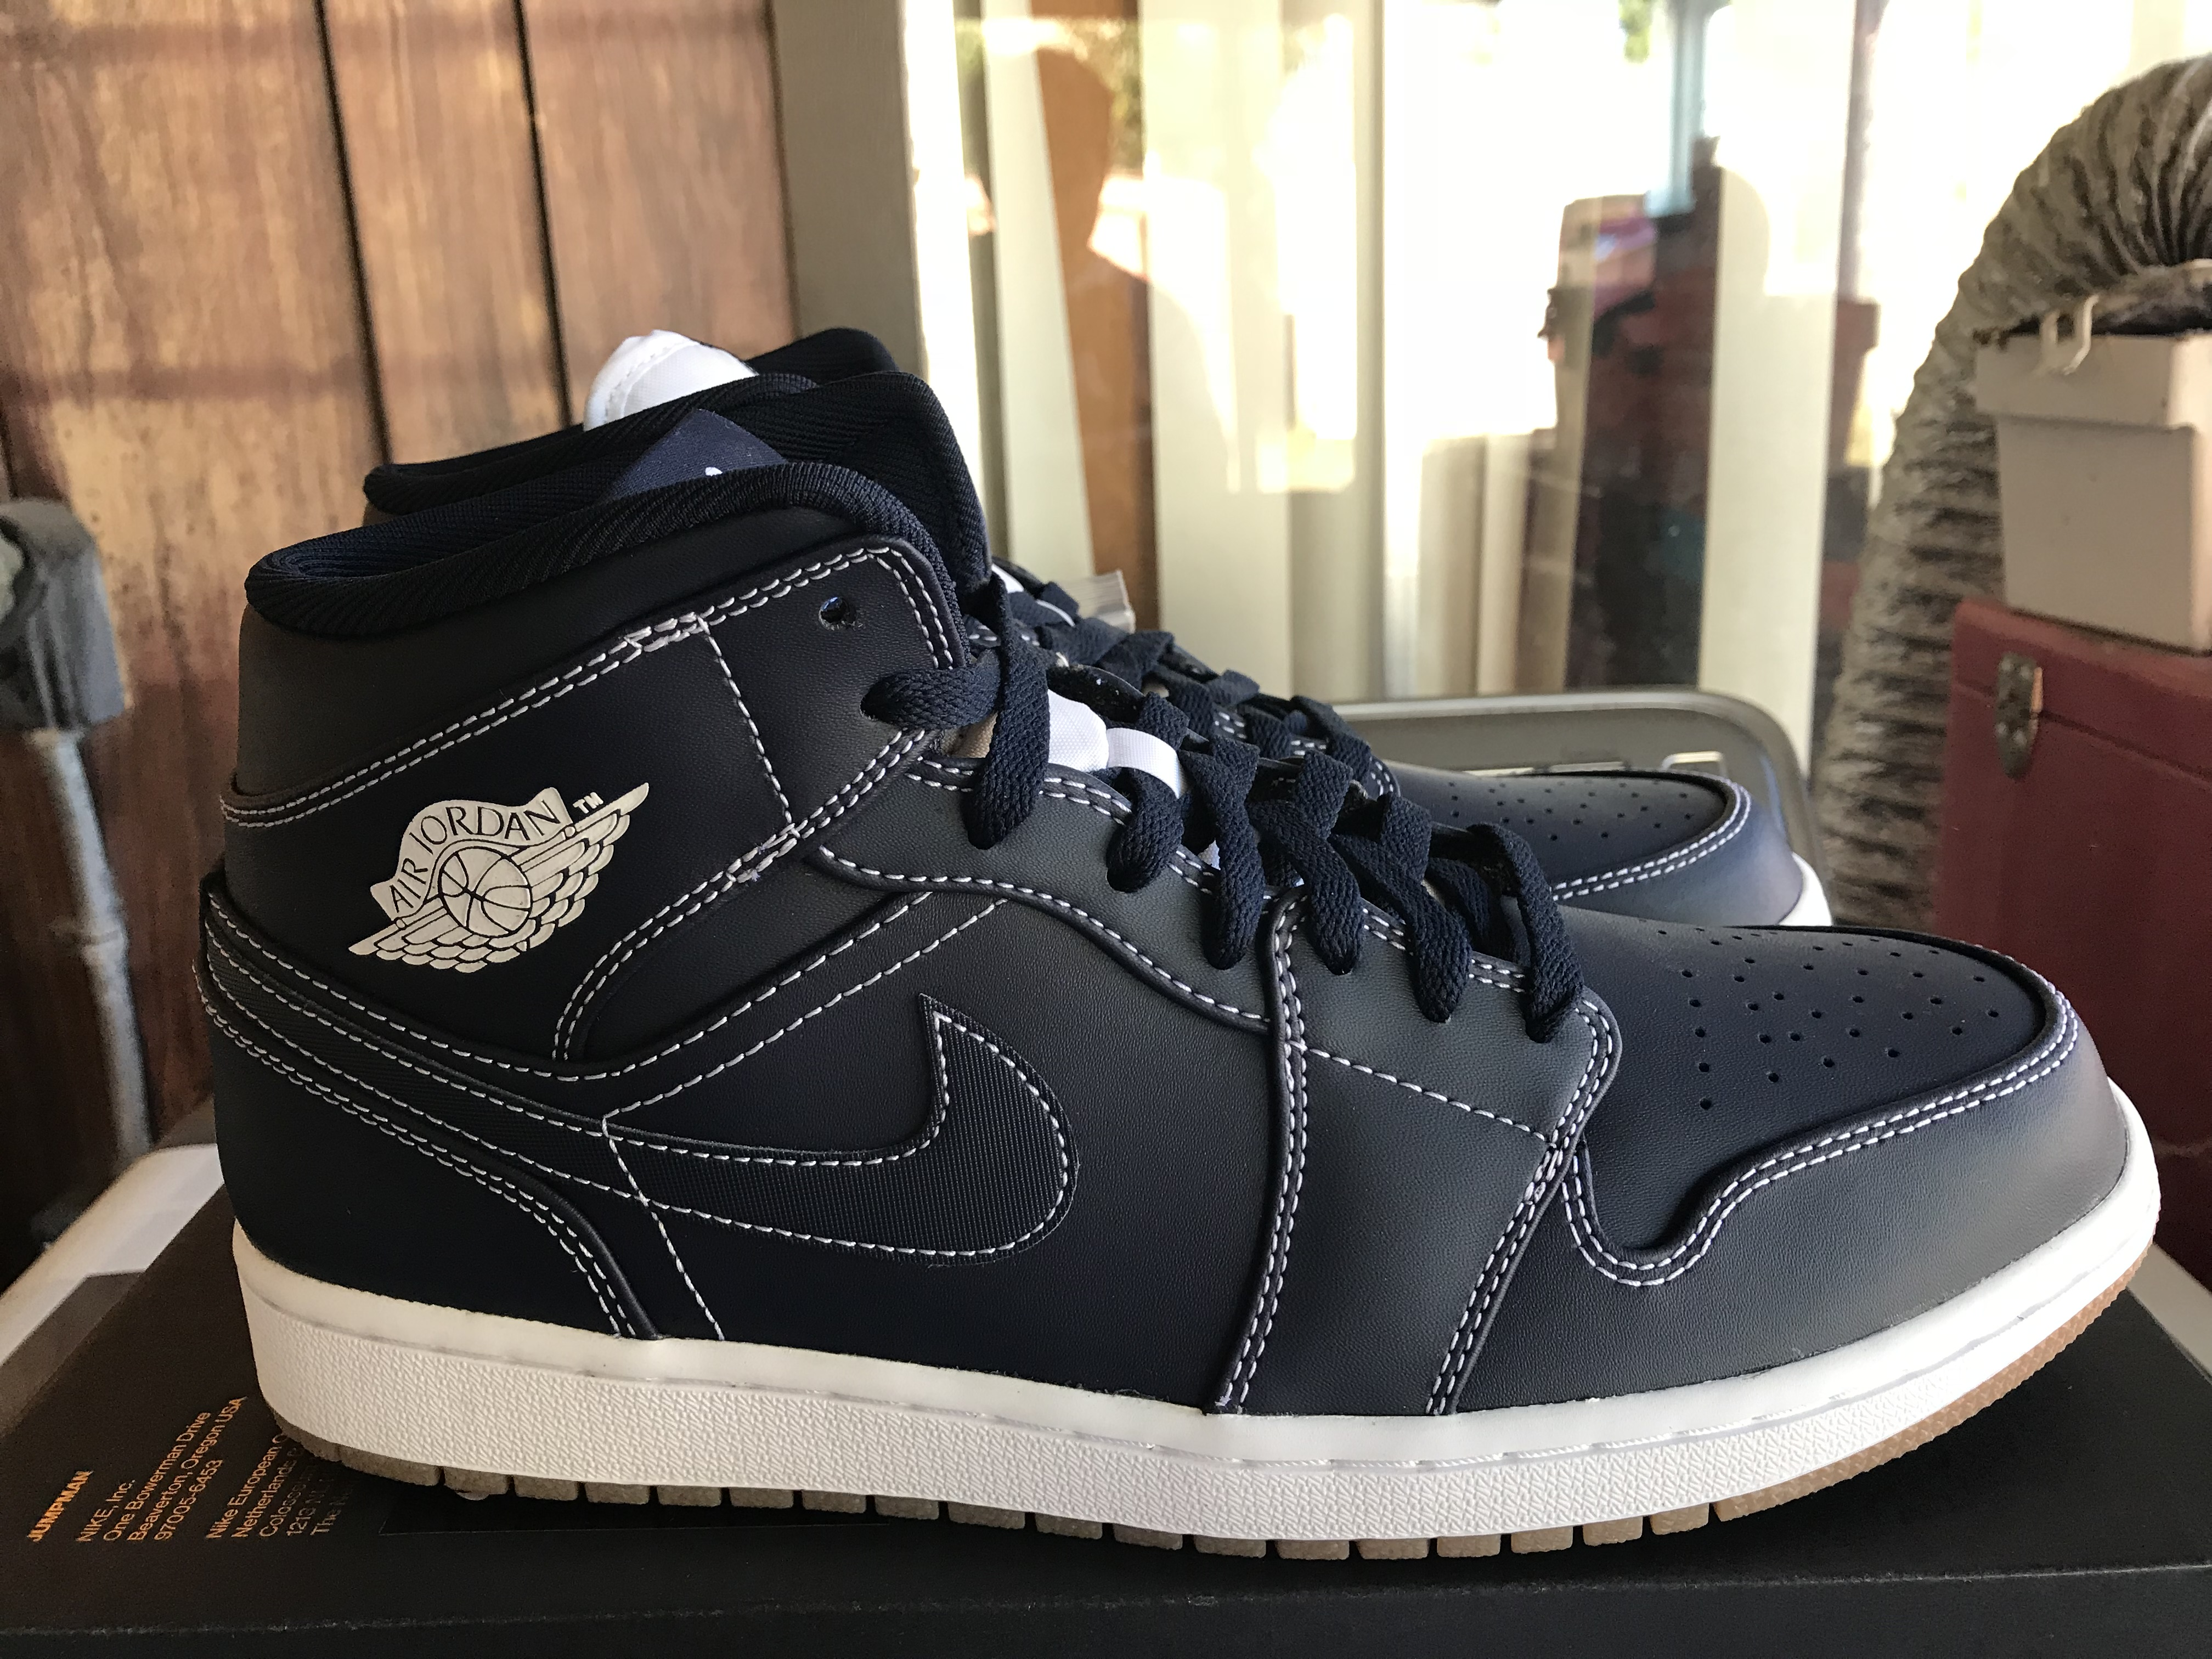 dd97a9d97e5b Nike × Jordan Brand. NEW Nike Air Jordan 1 Mid Re2pect Derek Jeter Size ...